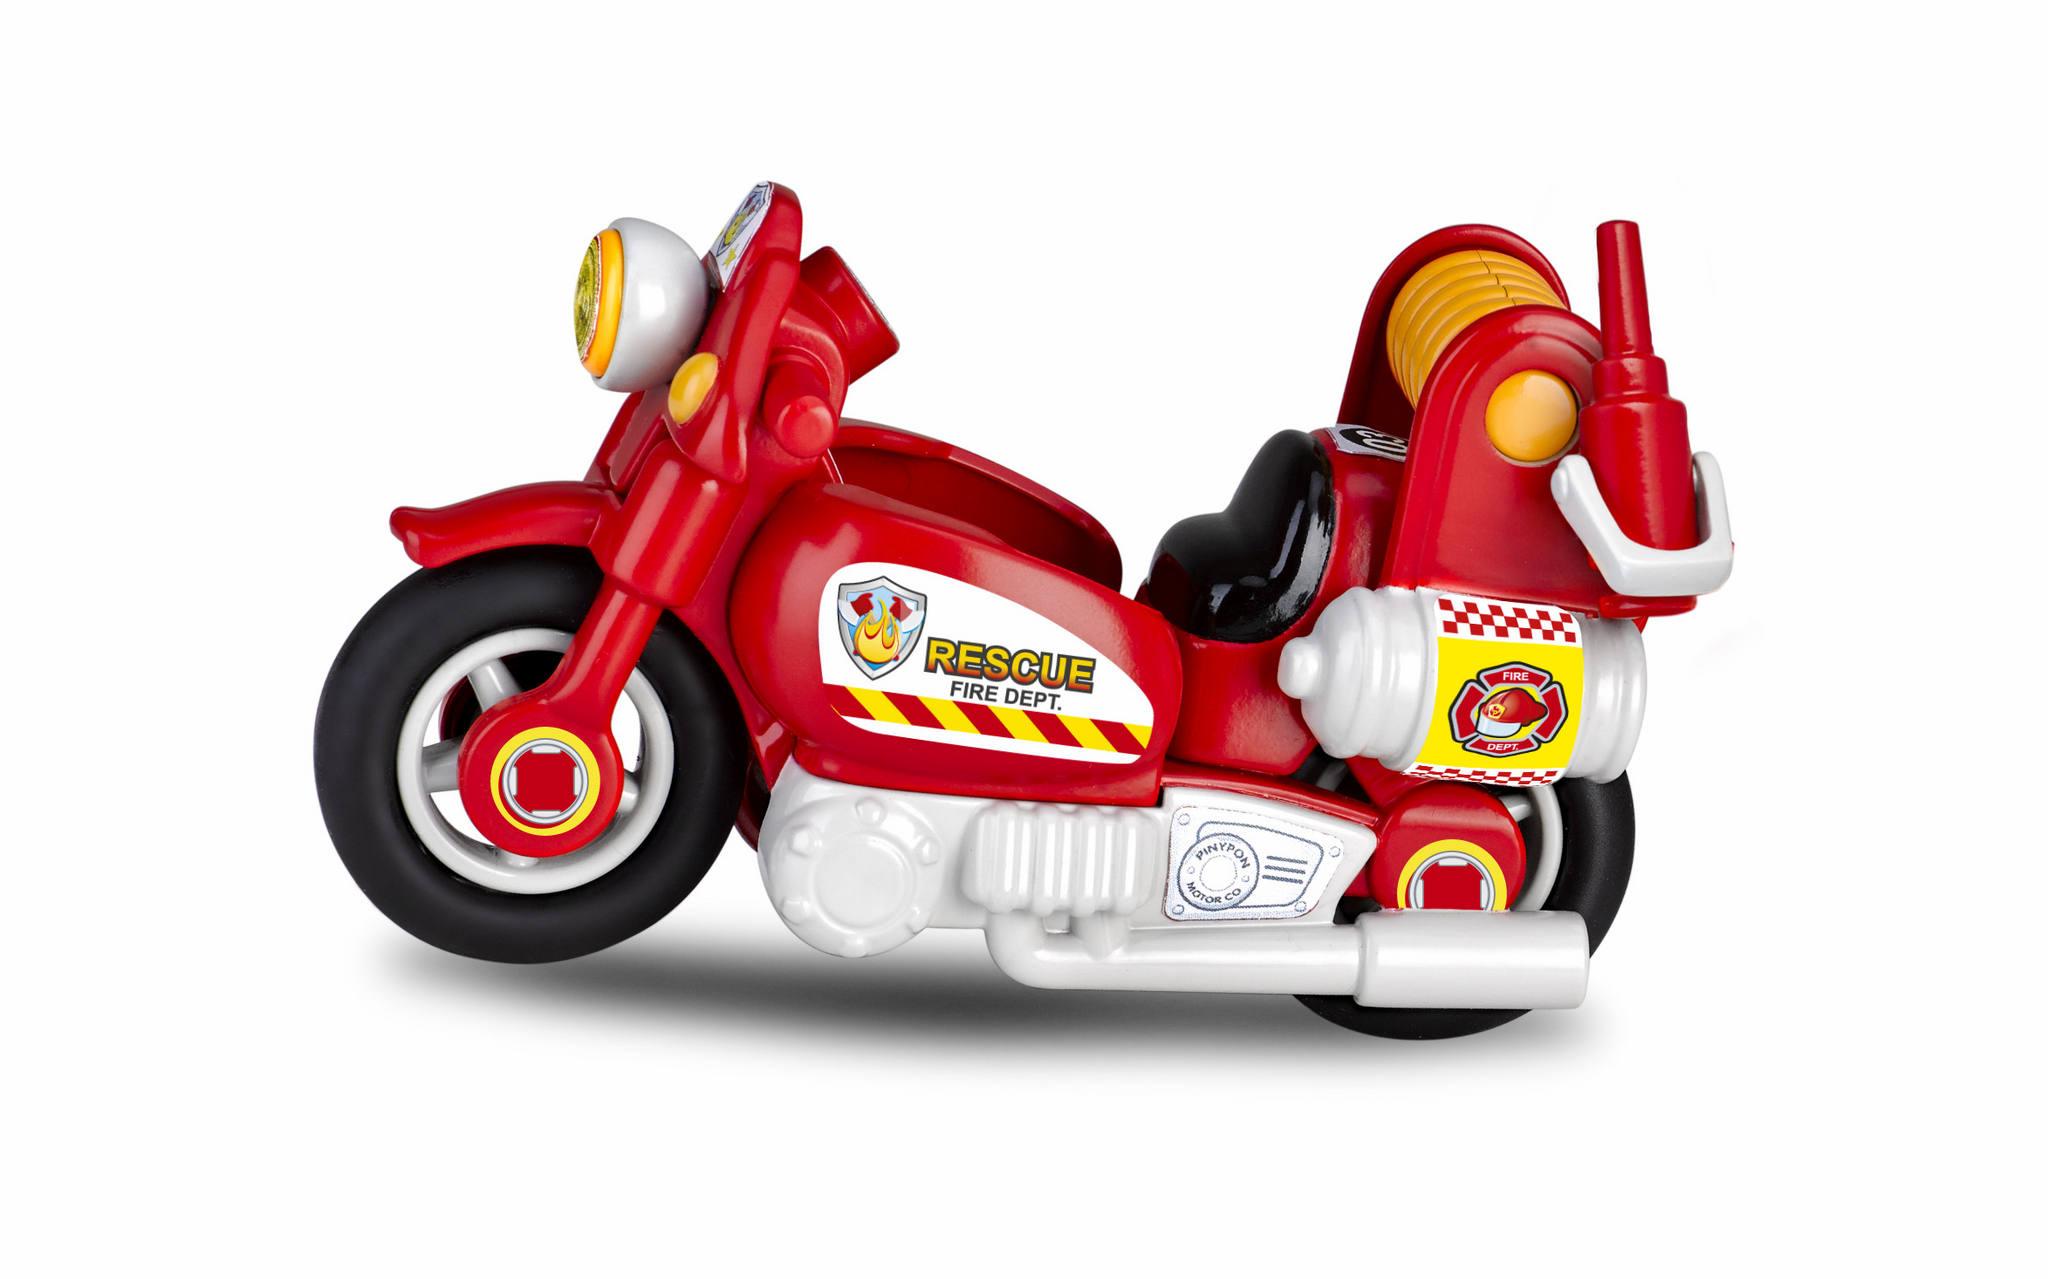 PINYPON ACTION FIREMAN MOTORBIKE 15636